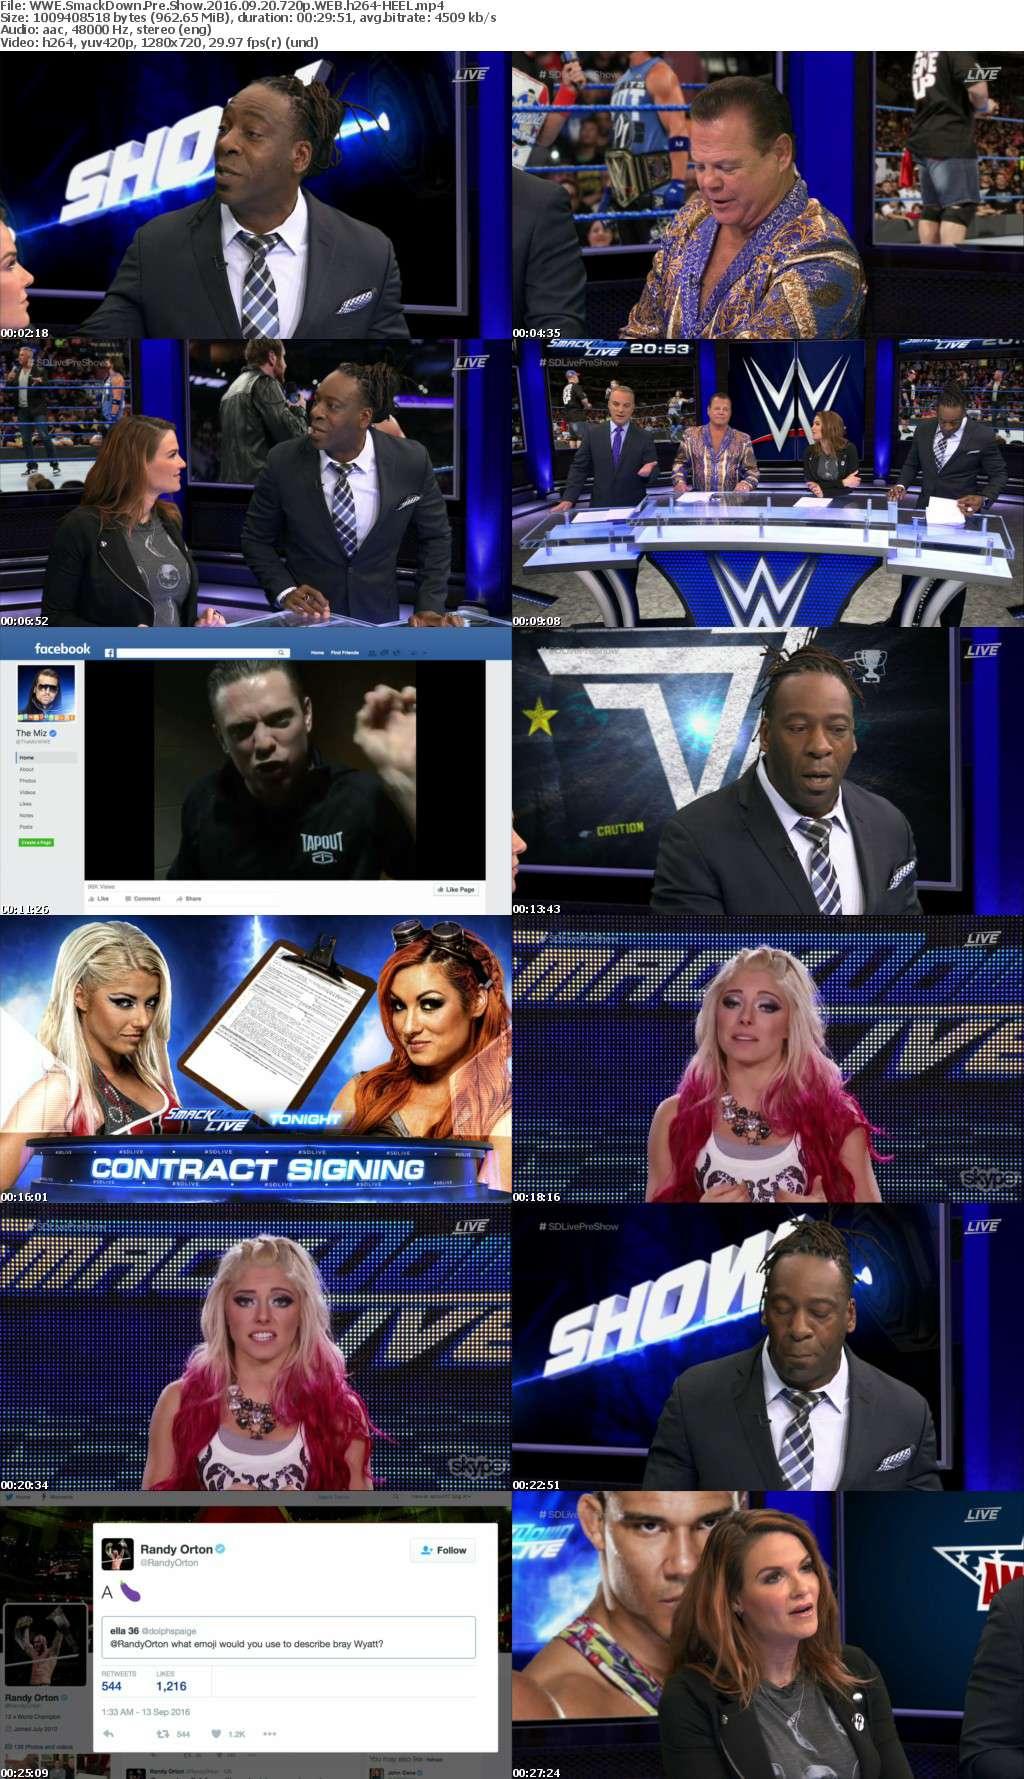 WWE SmackDown Pre Show 2016 09 20 720p WEB h264-HEEL